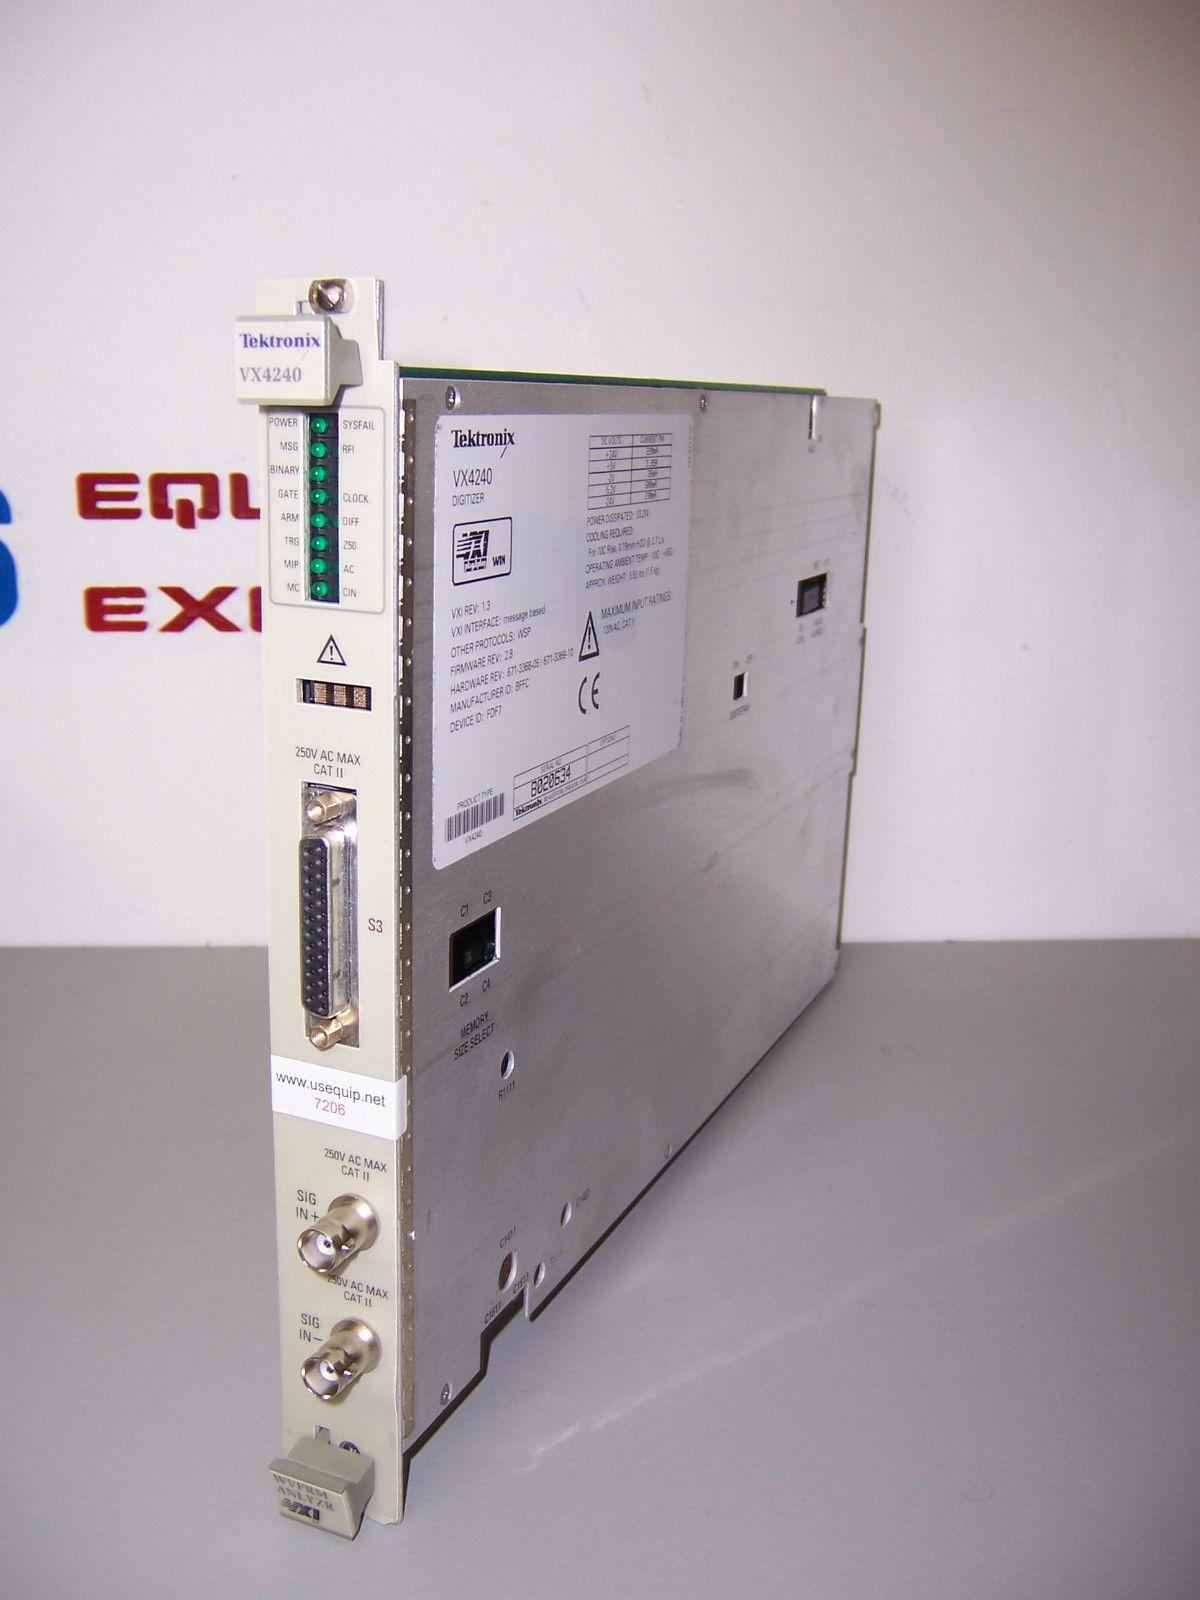 7206 TEKTRONIX VXI VX4240 CARD 16 CHANNEL 200 kHz VXI DIGITIZER MODULE